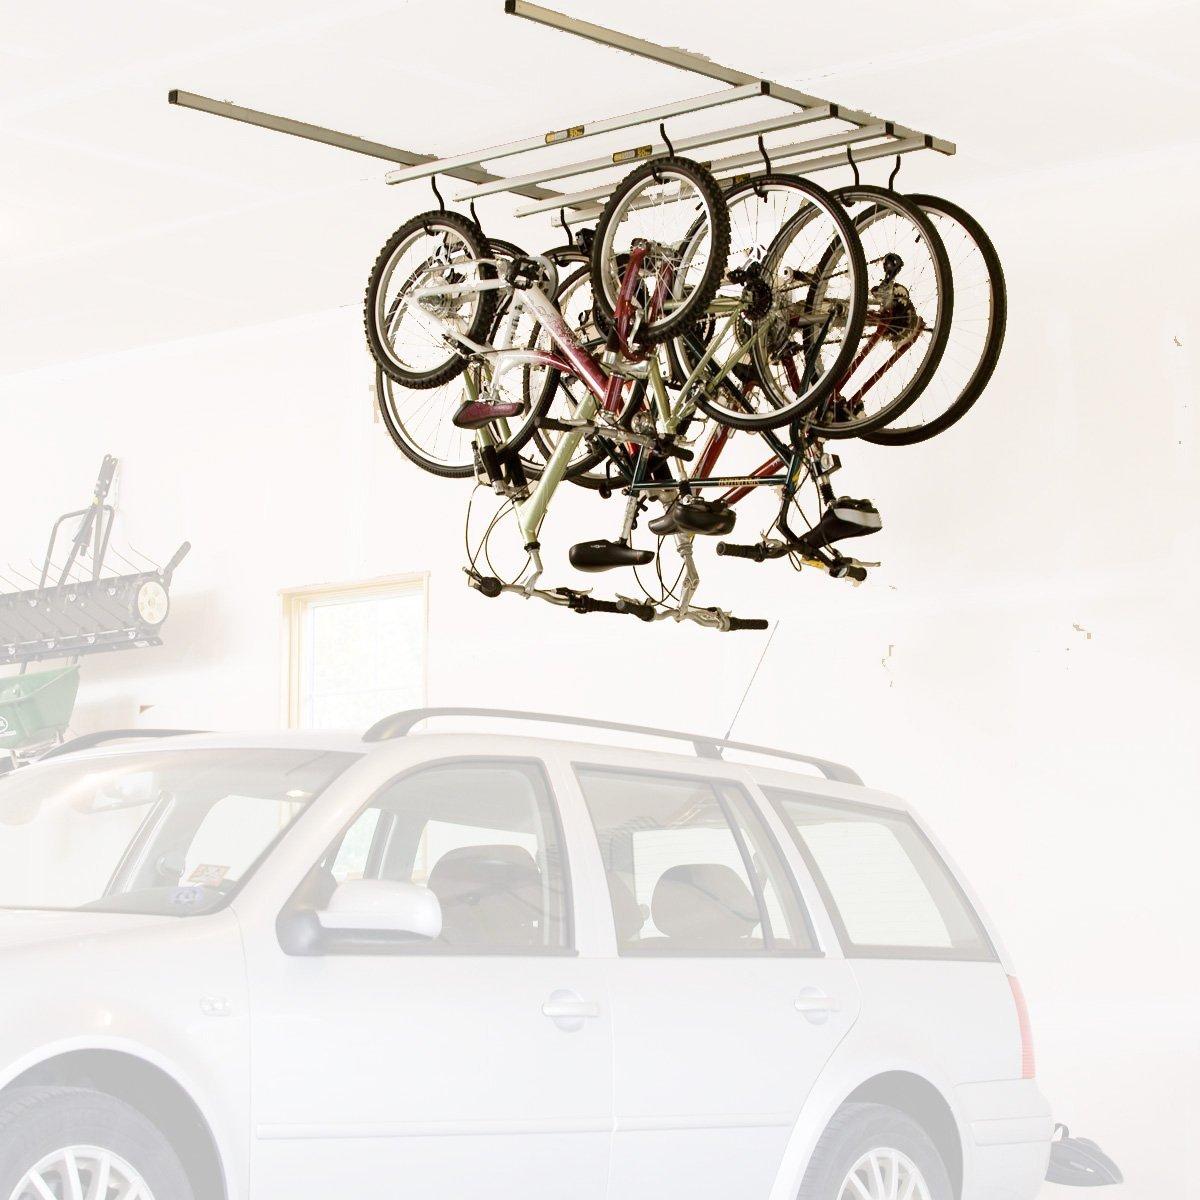 Porte-Vélo/VTT 2 Add-On Cycle Glide-Blanc